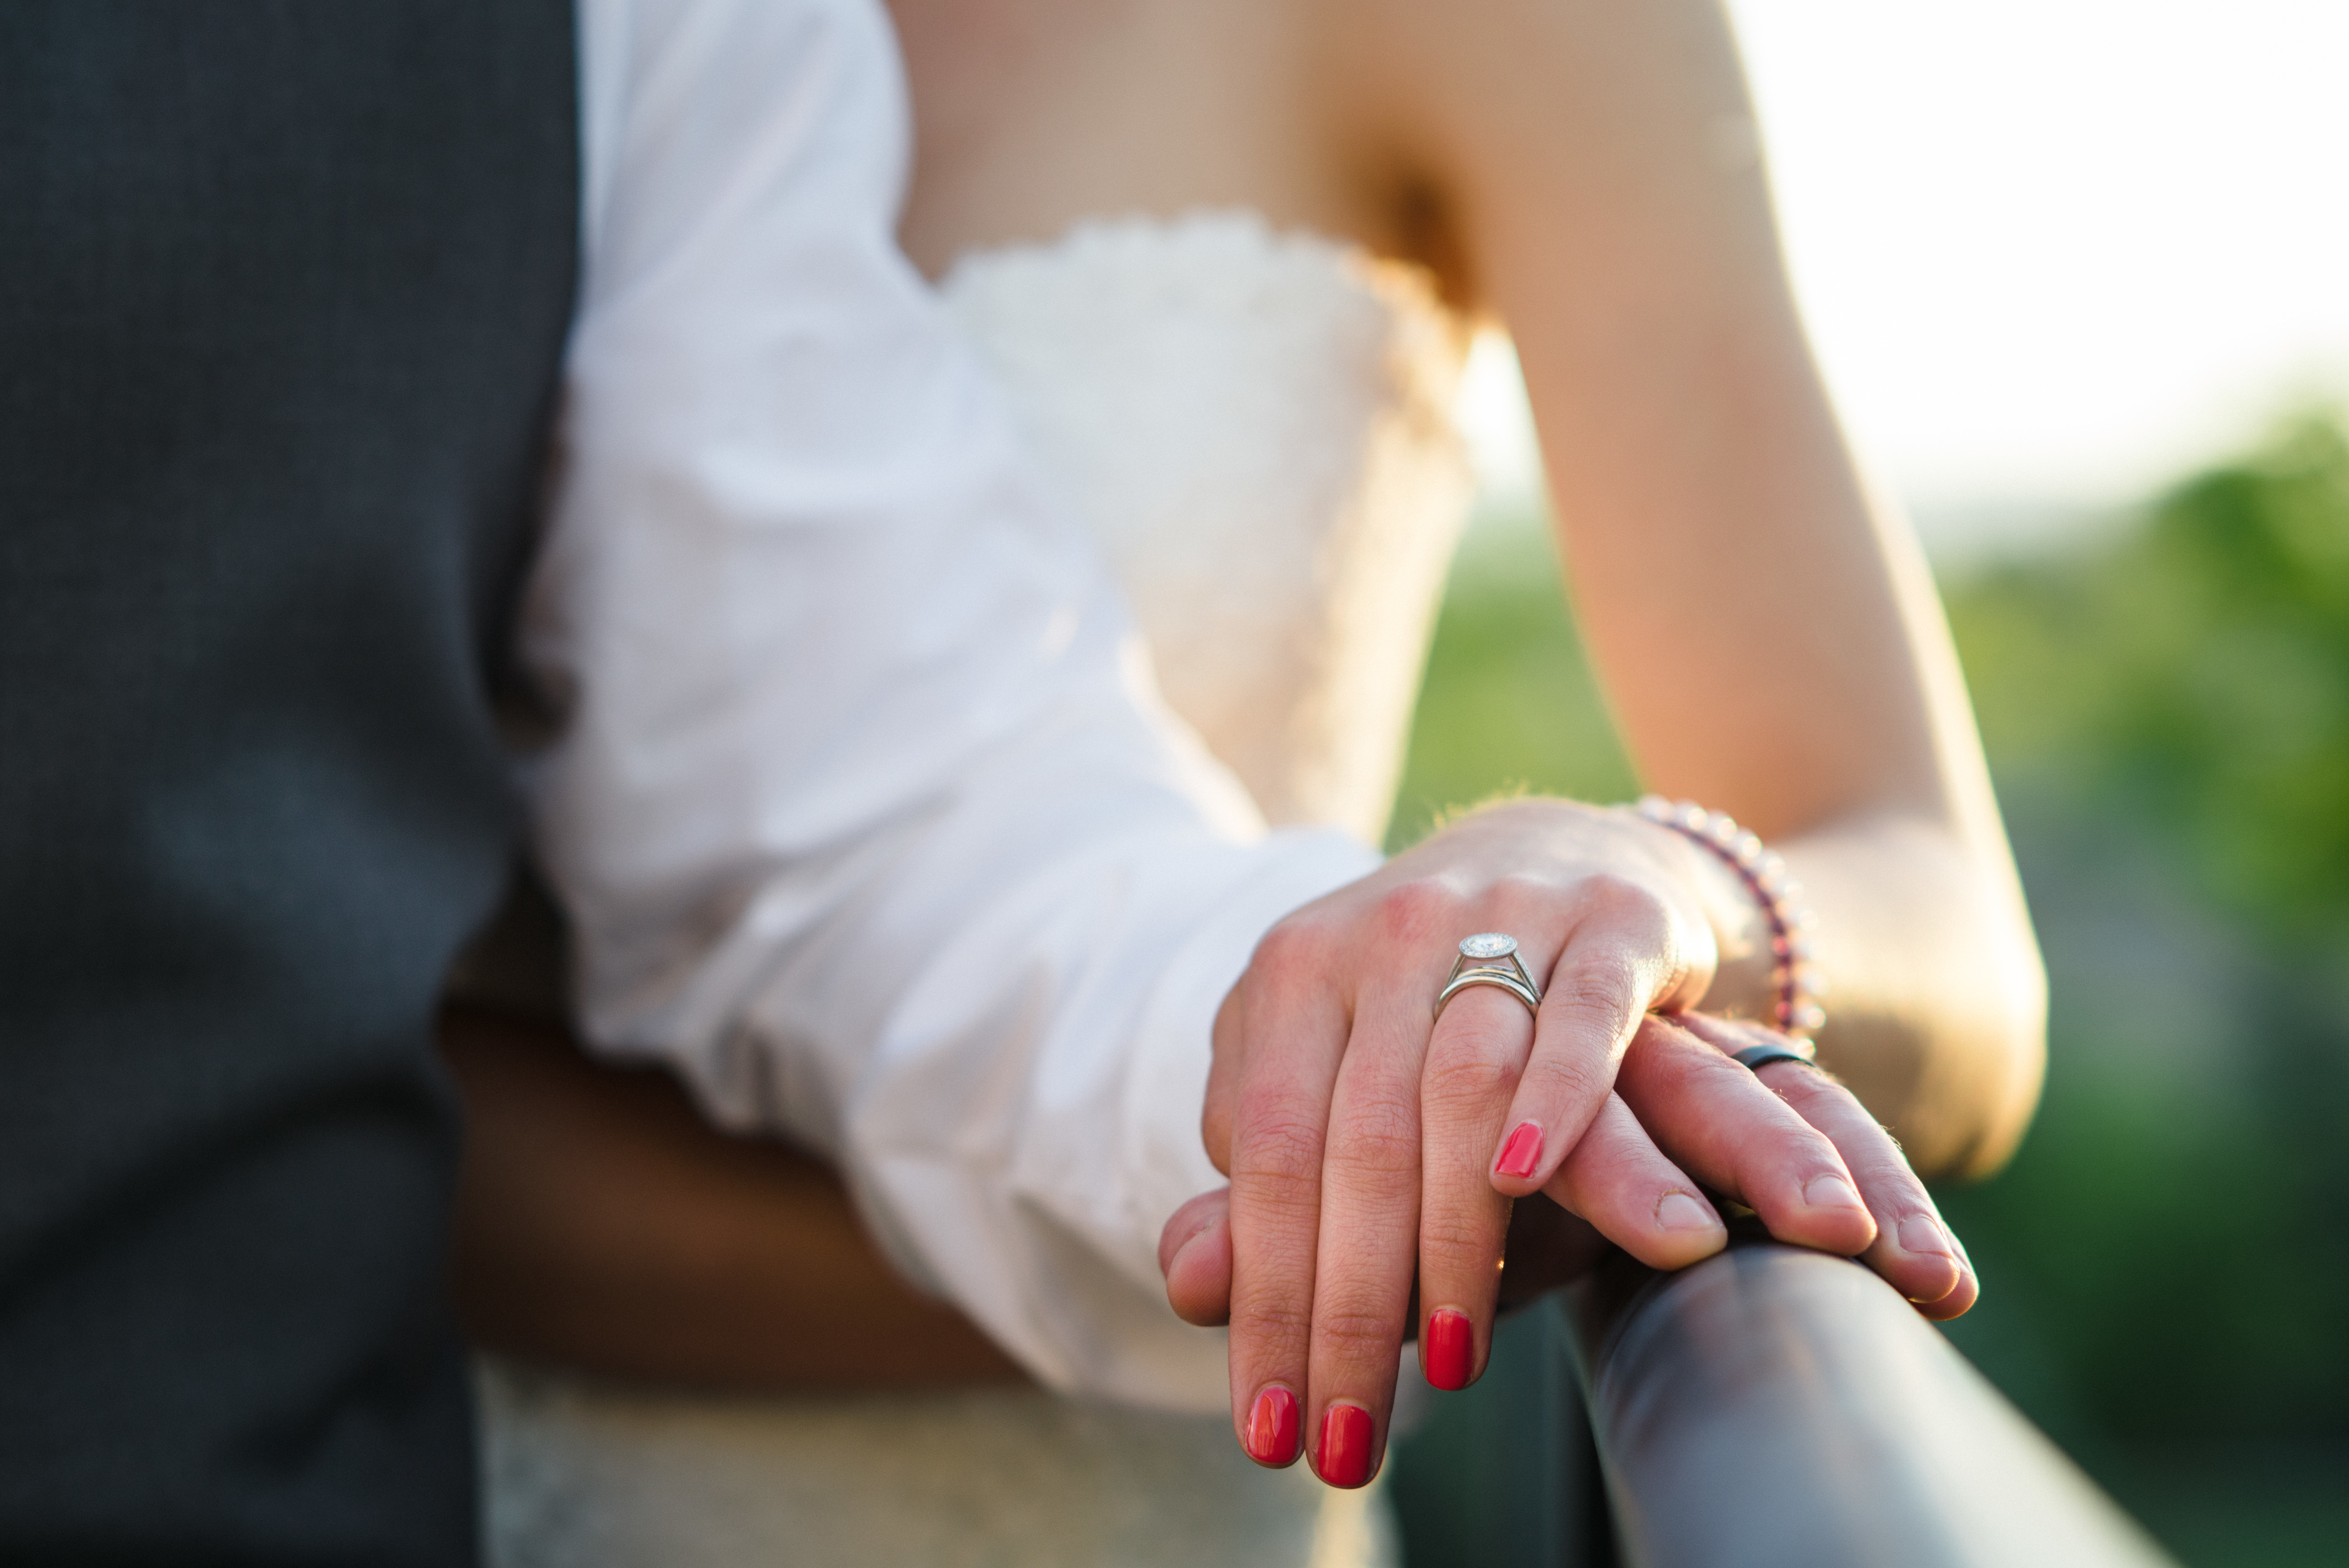 Жених невеста свадьба руки маникюр